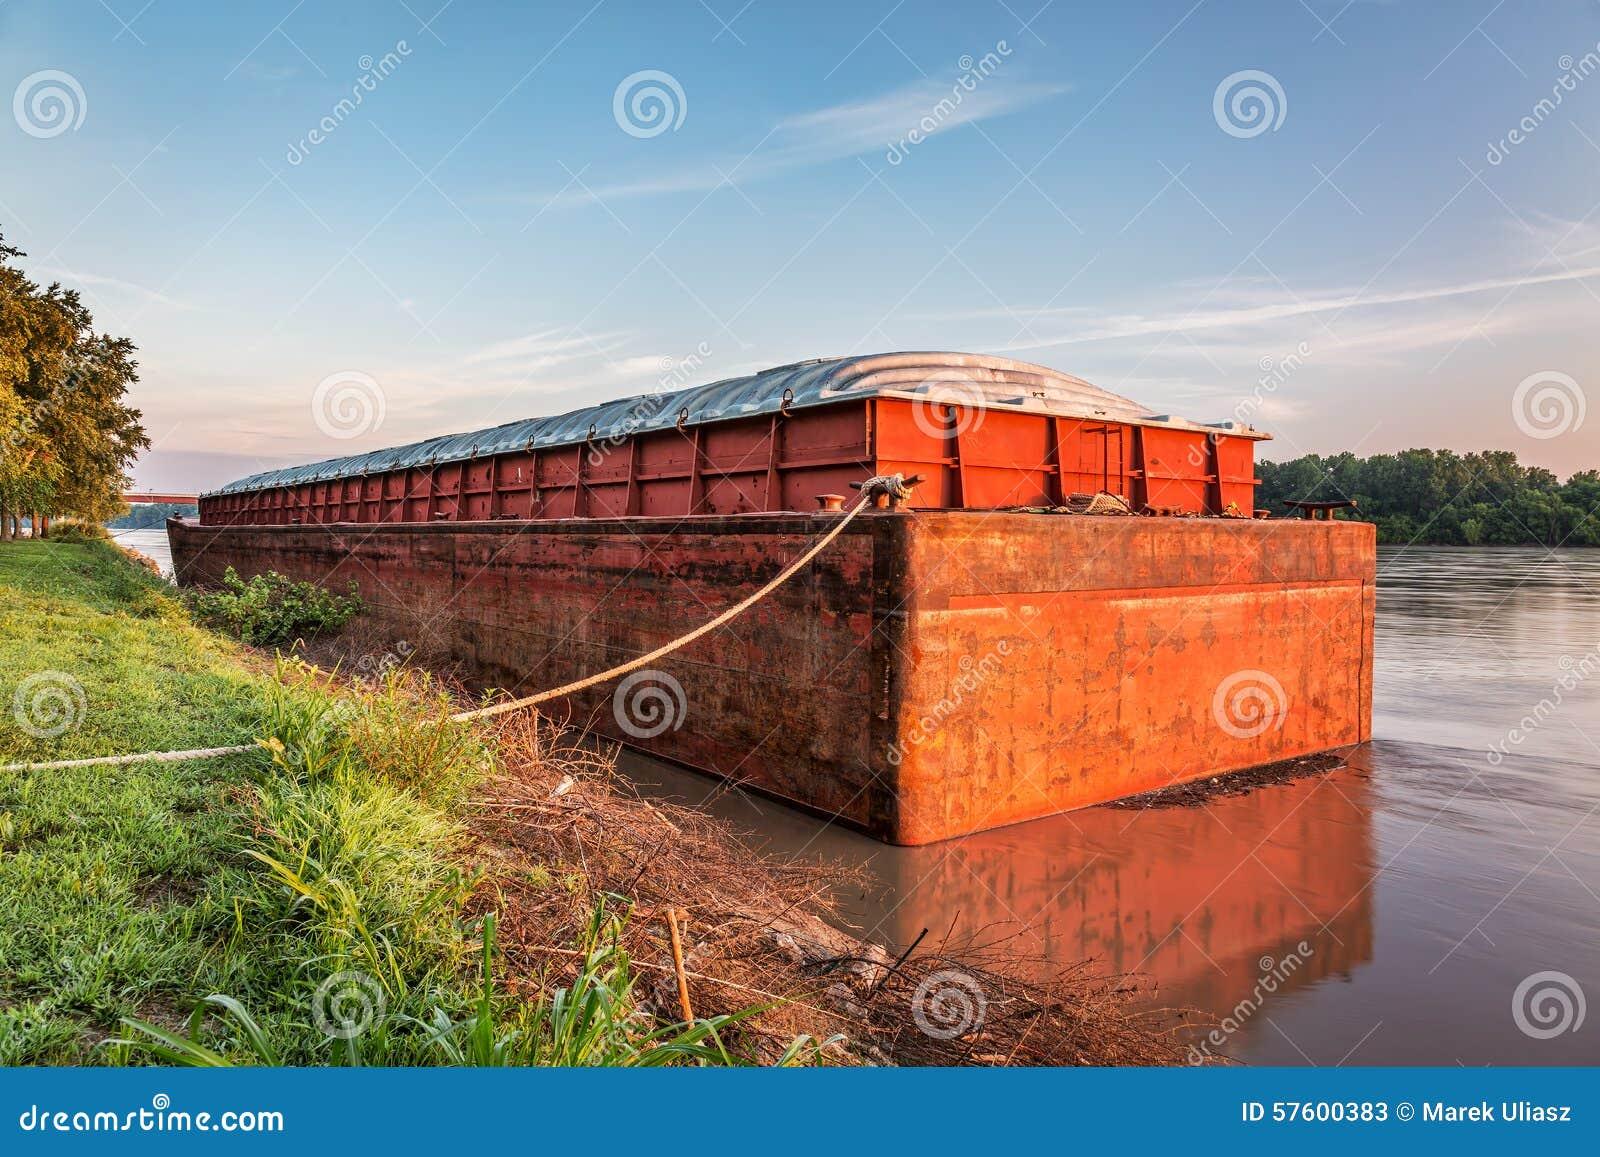 barge on missouri river stock image image of ship rusty 57600383